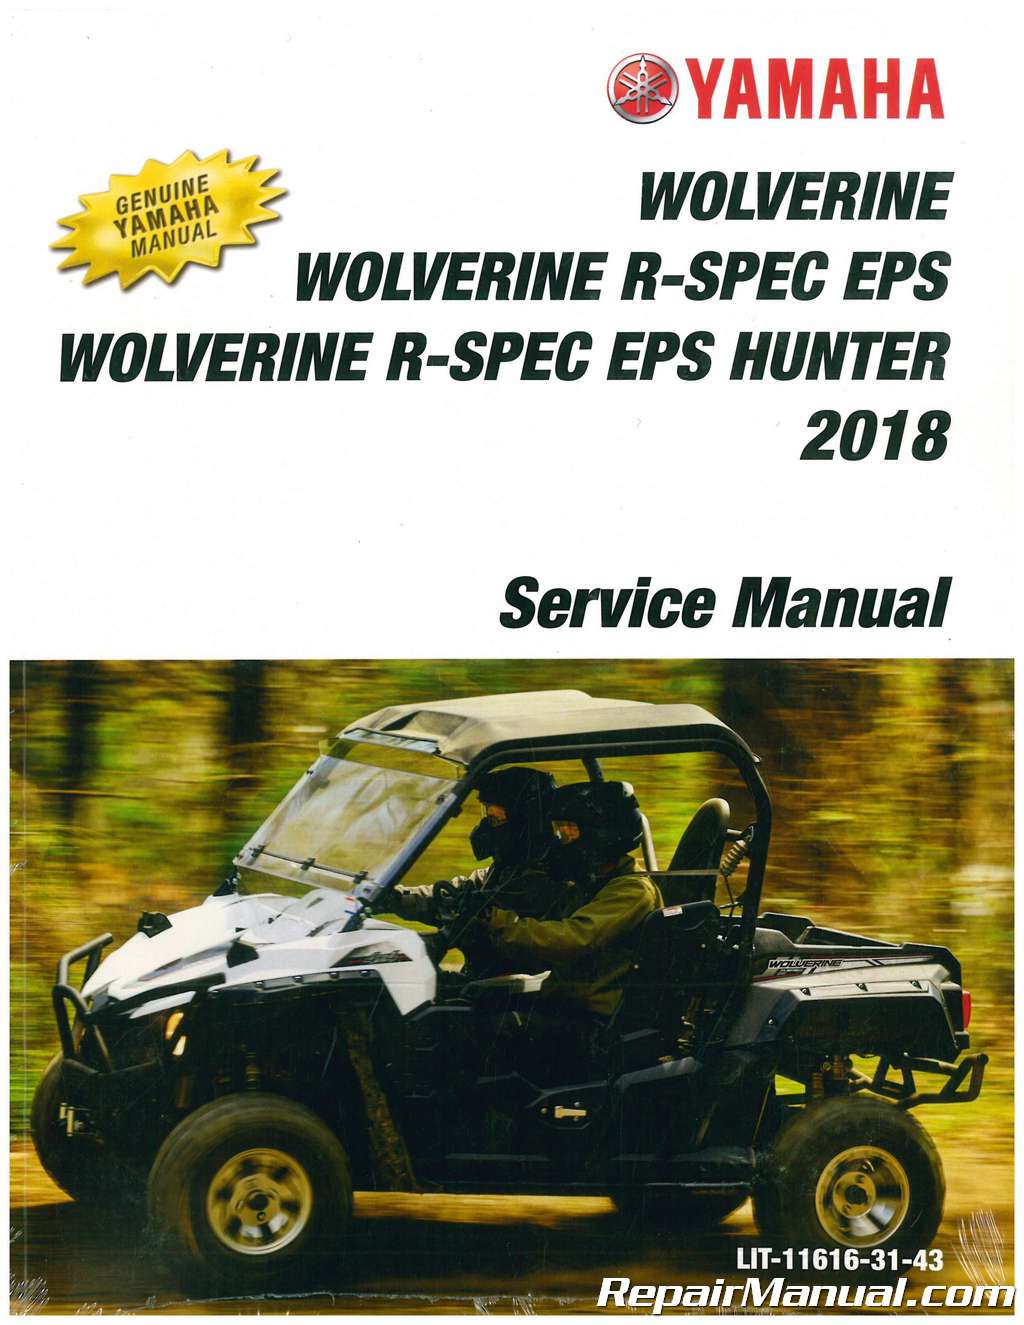 2018 yamaha wolverine 700 atv service manual rh repairmanual com yamaha wolverine 350 manual yamaha wolverine manual free